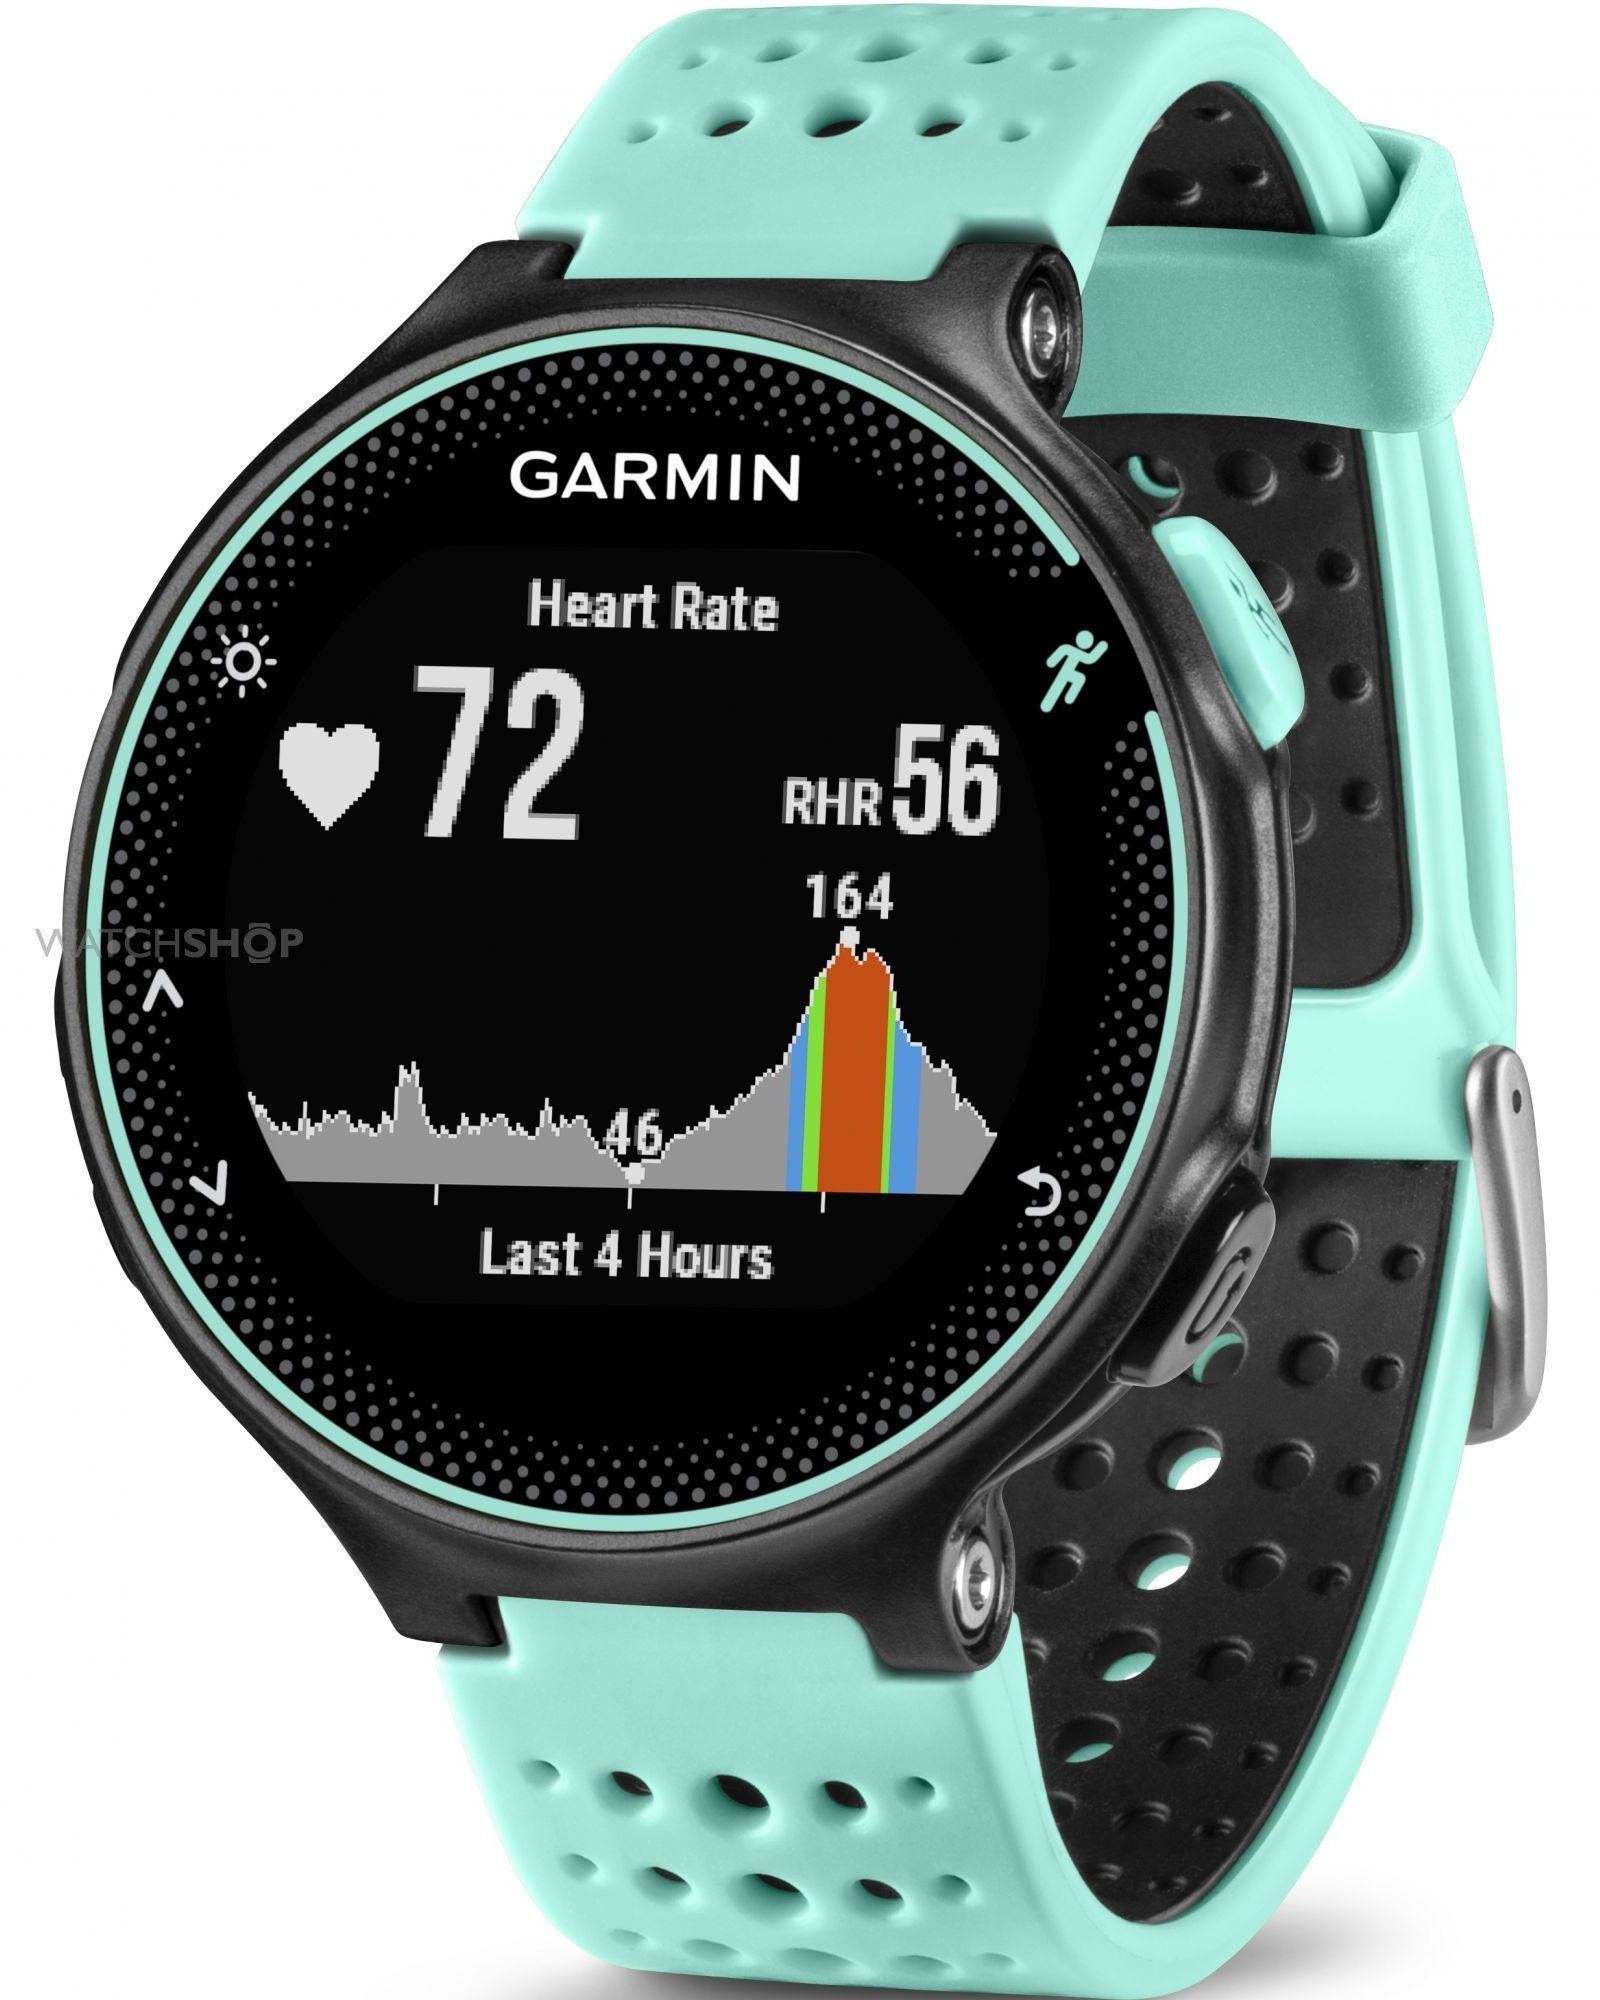 Garmin Forerunner 235 reloj running pulsometro